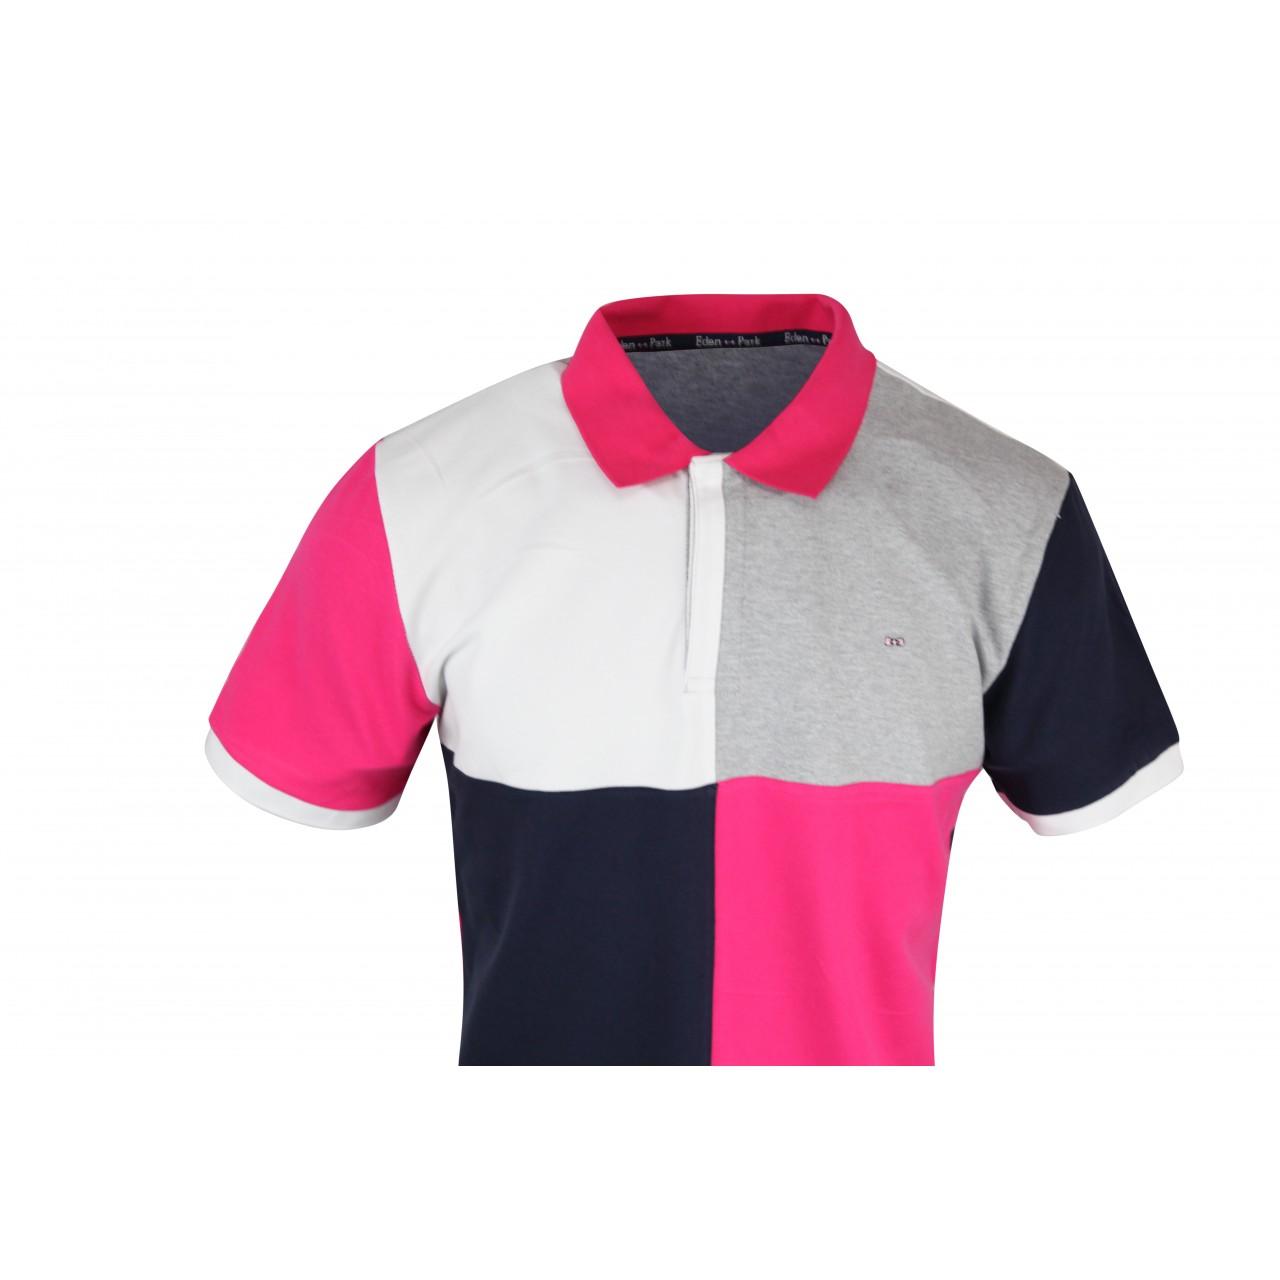 Men's Square Cut Design Colored Collar